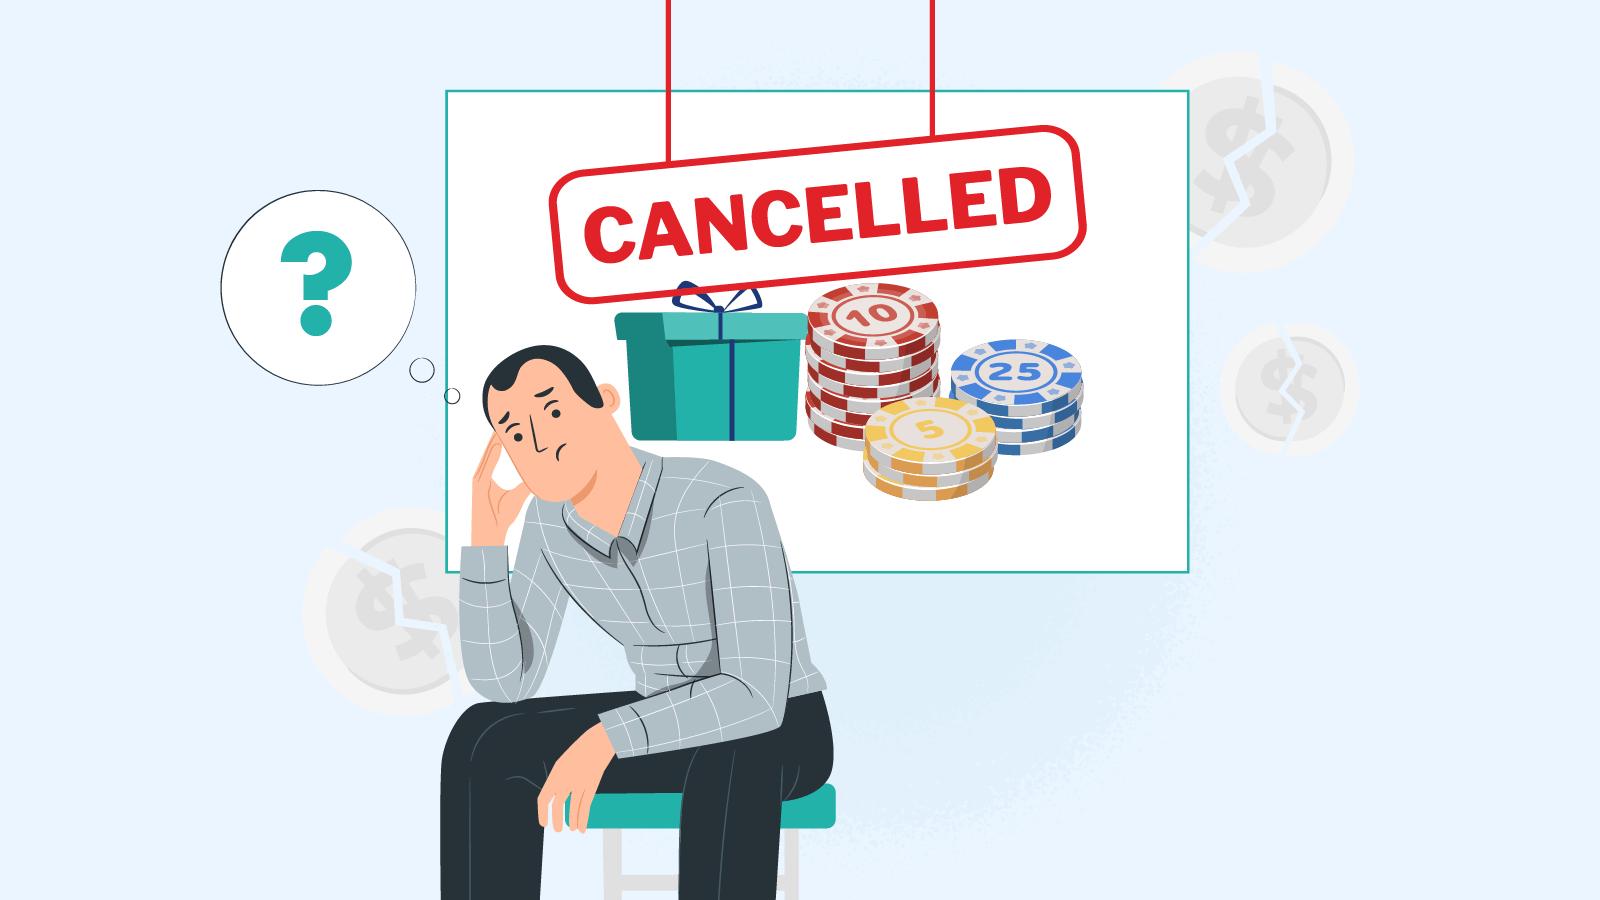 How to avoid having your bonus cancelled